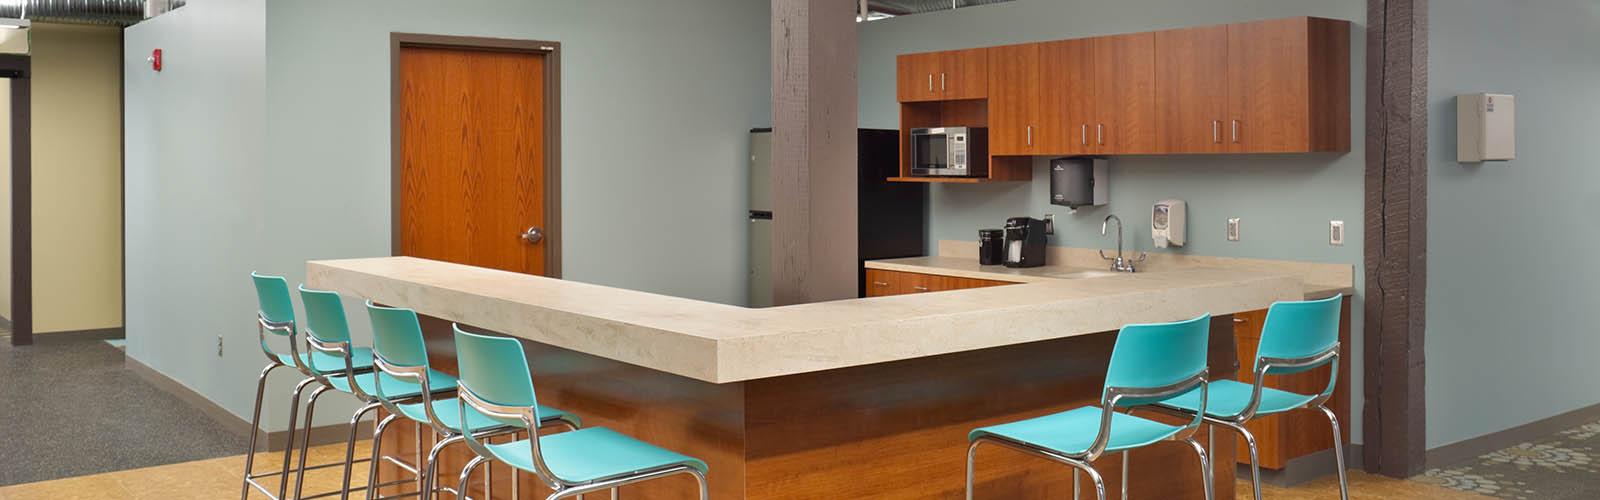 Truman Medical Center Behavioral Health Clinic 4